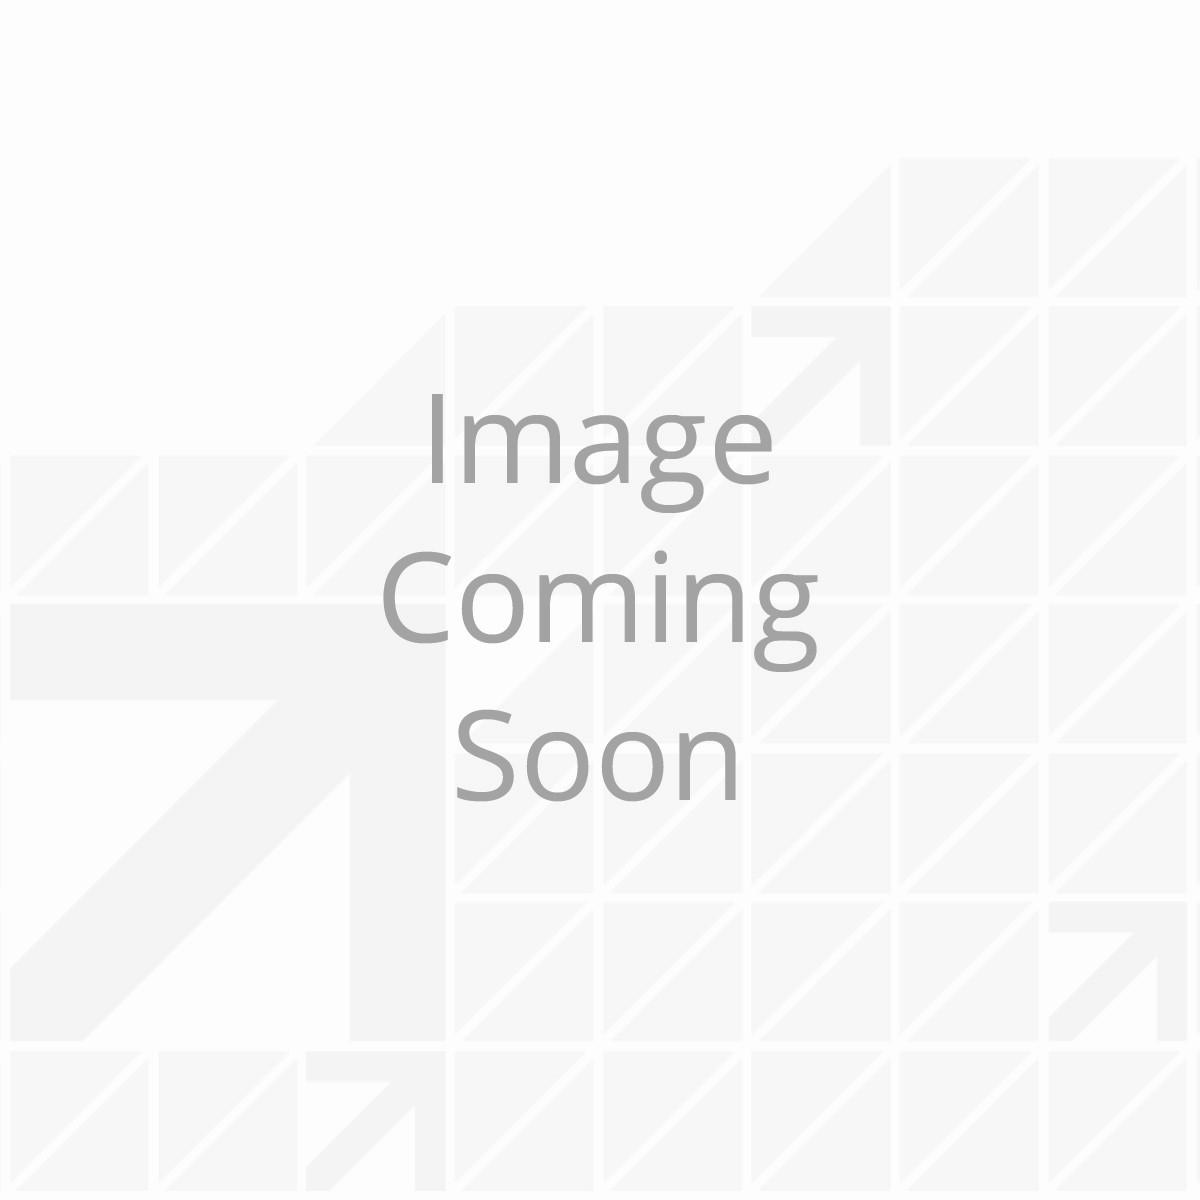 21' Power & Hybrid Awning Roller Assembly - Prepflex Silver Fade